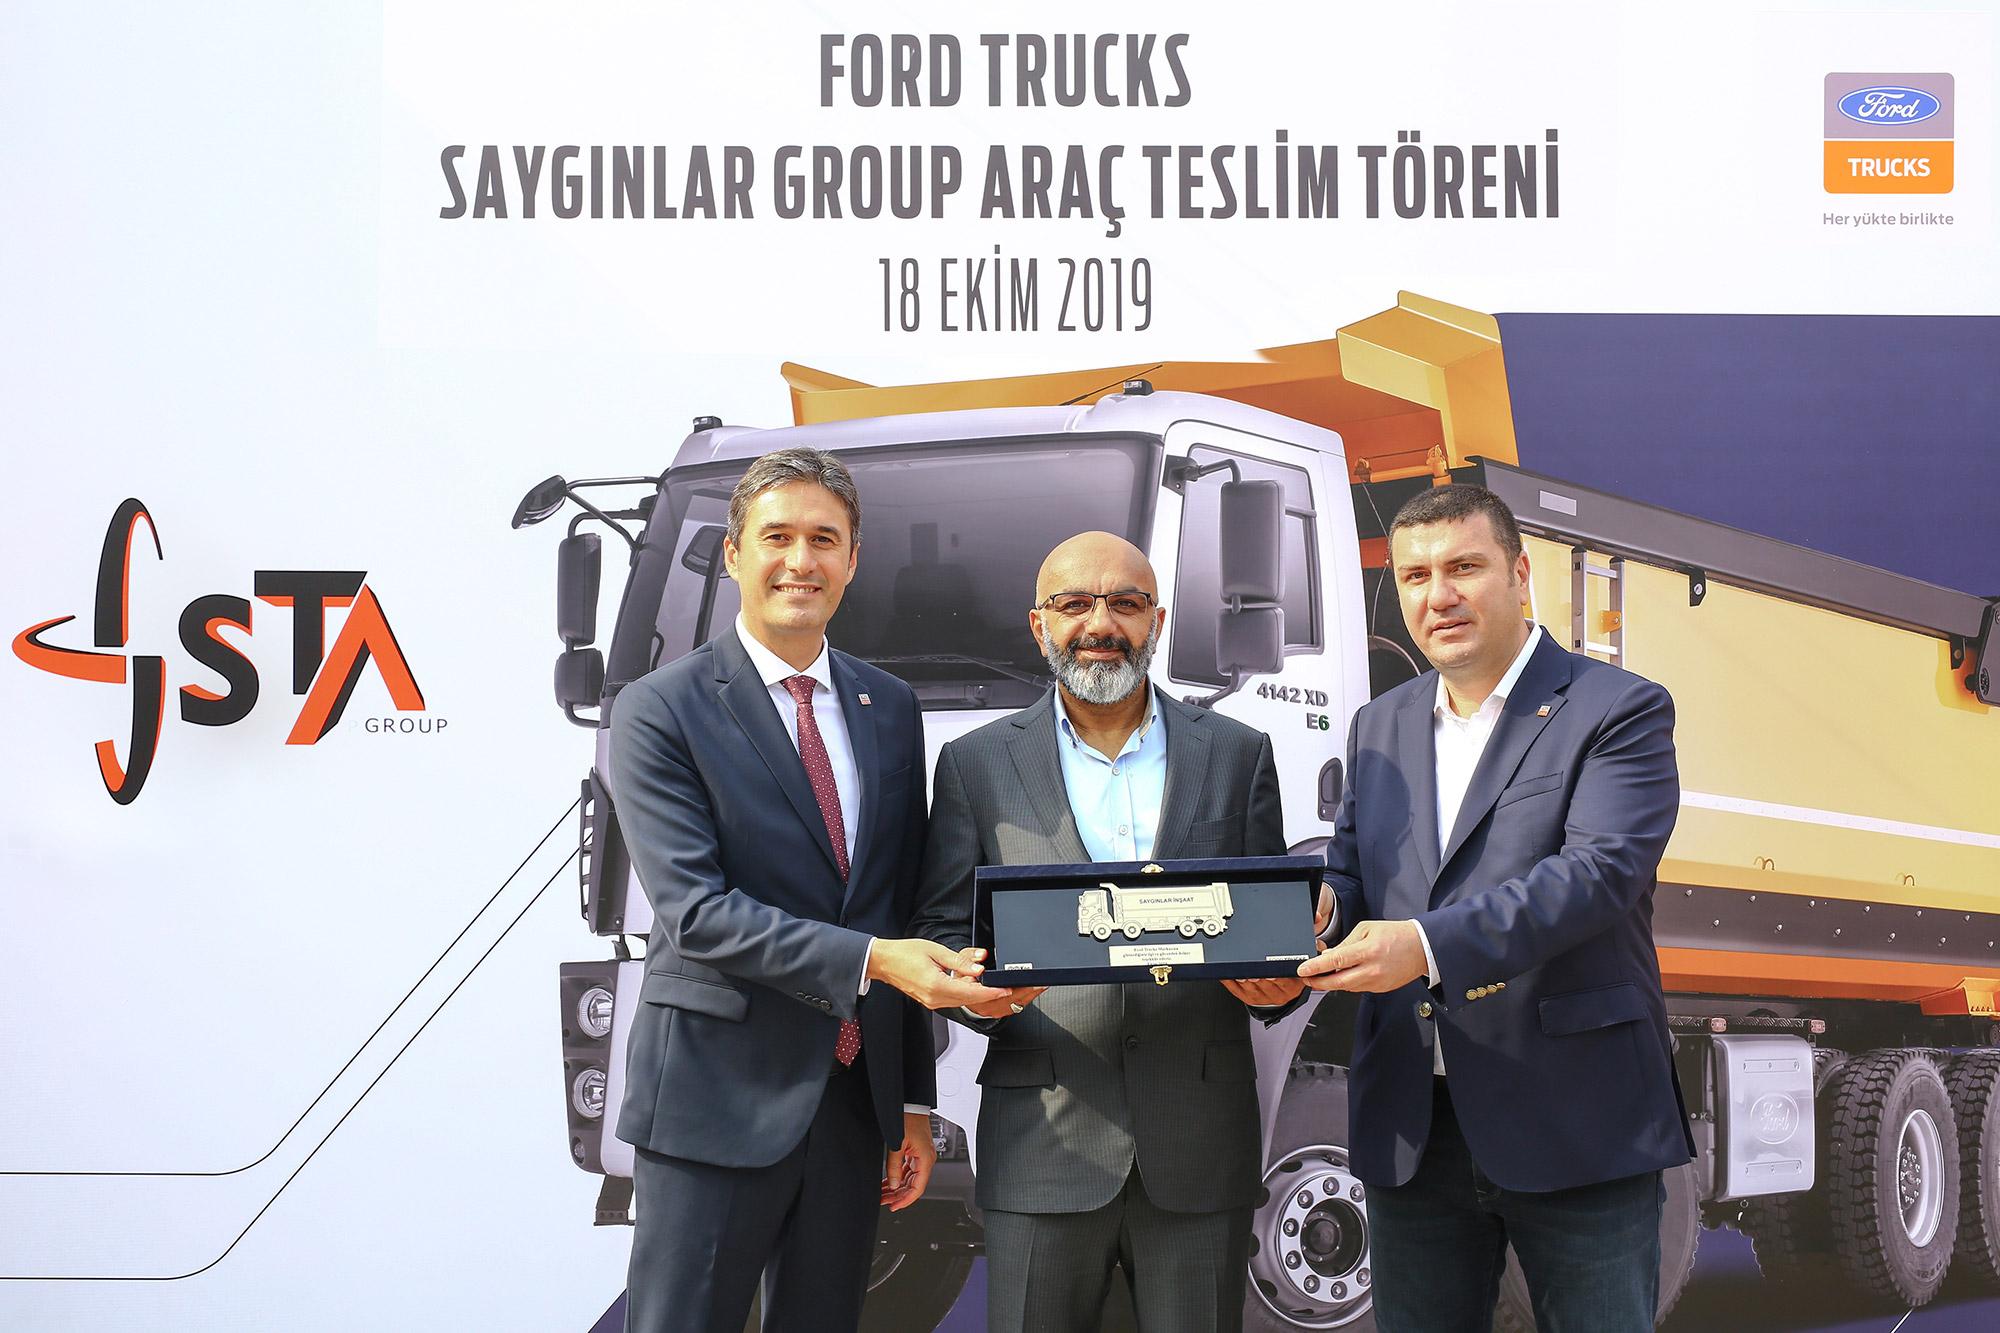 ford-trucks-sayginlar-insaat-arac-teslim-toreni.jpg